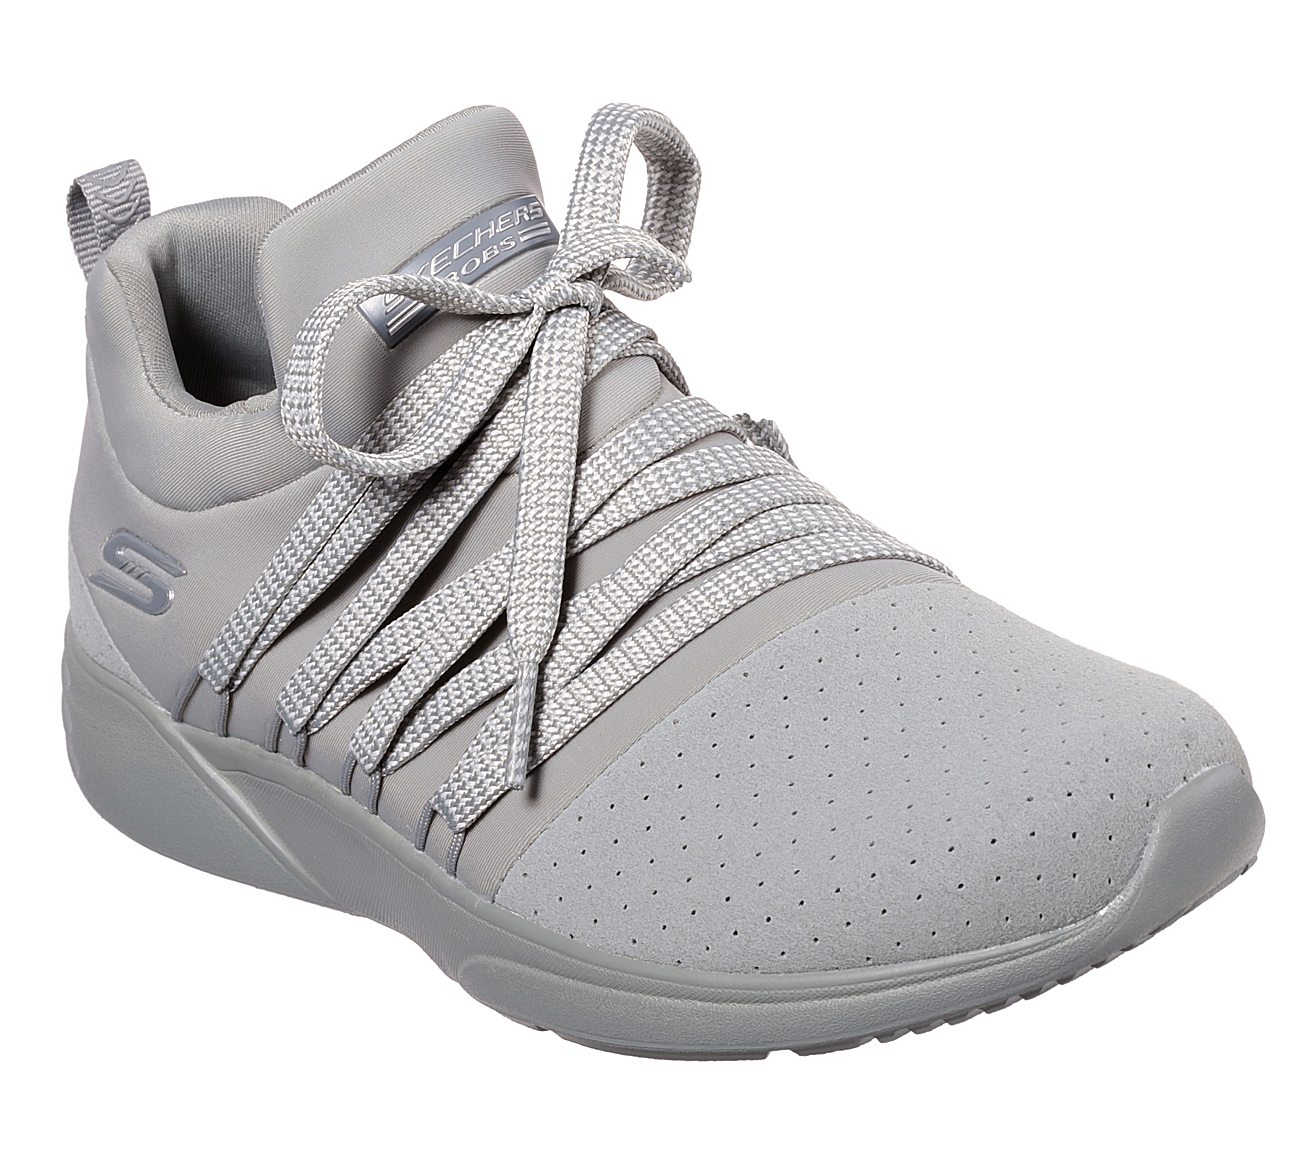 skechers moon shoes